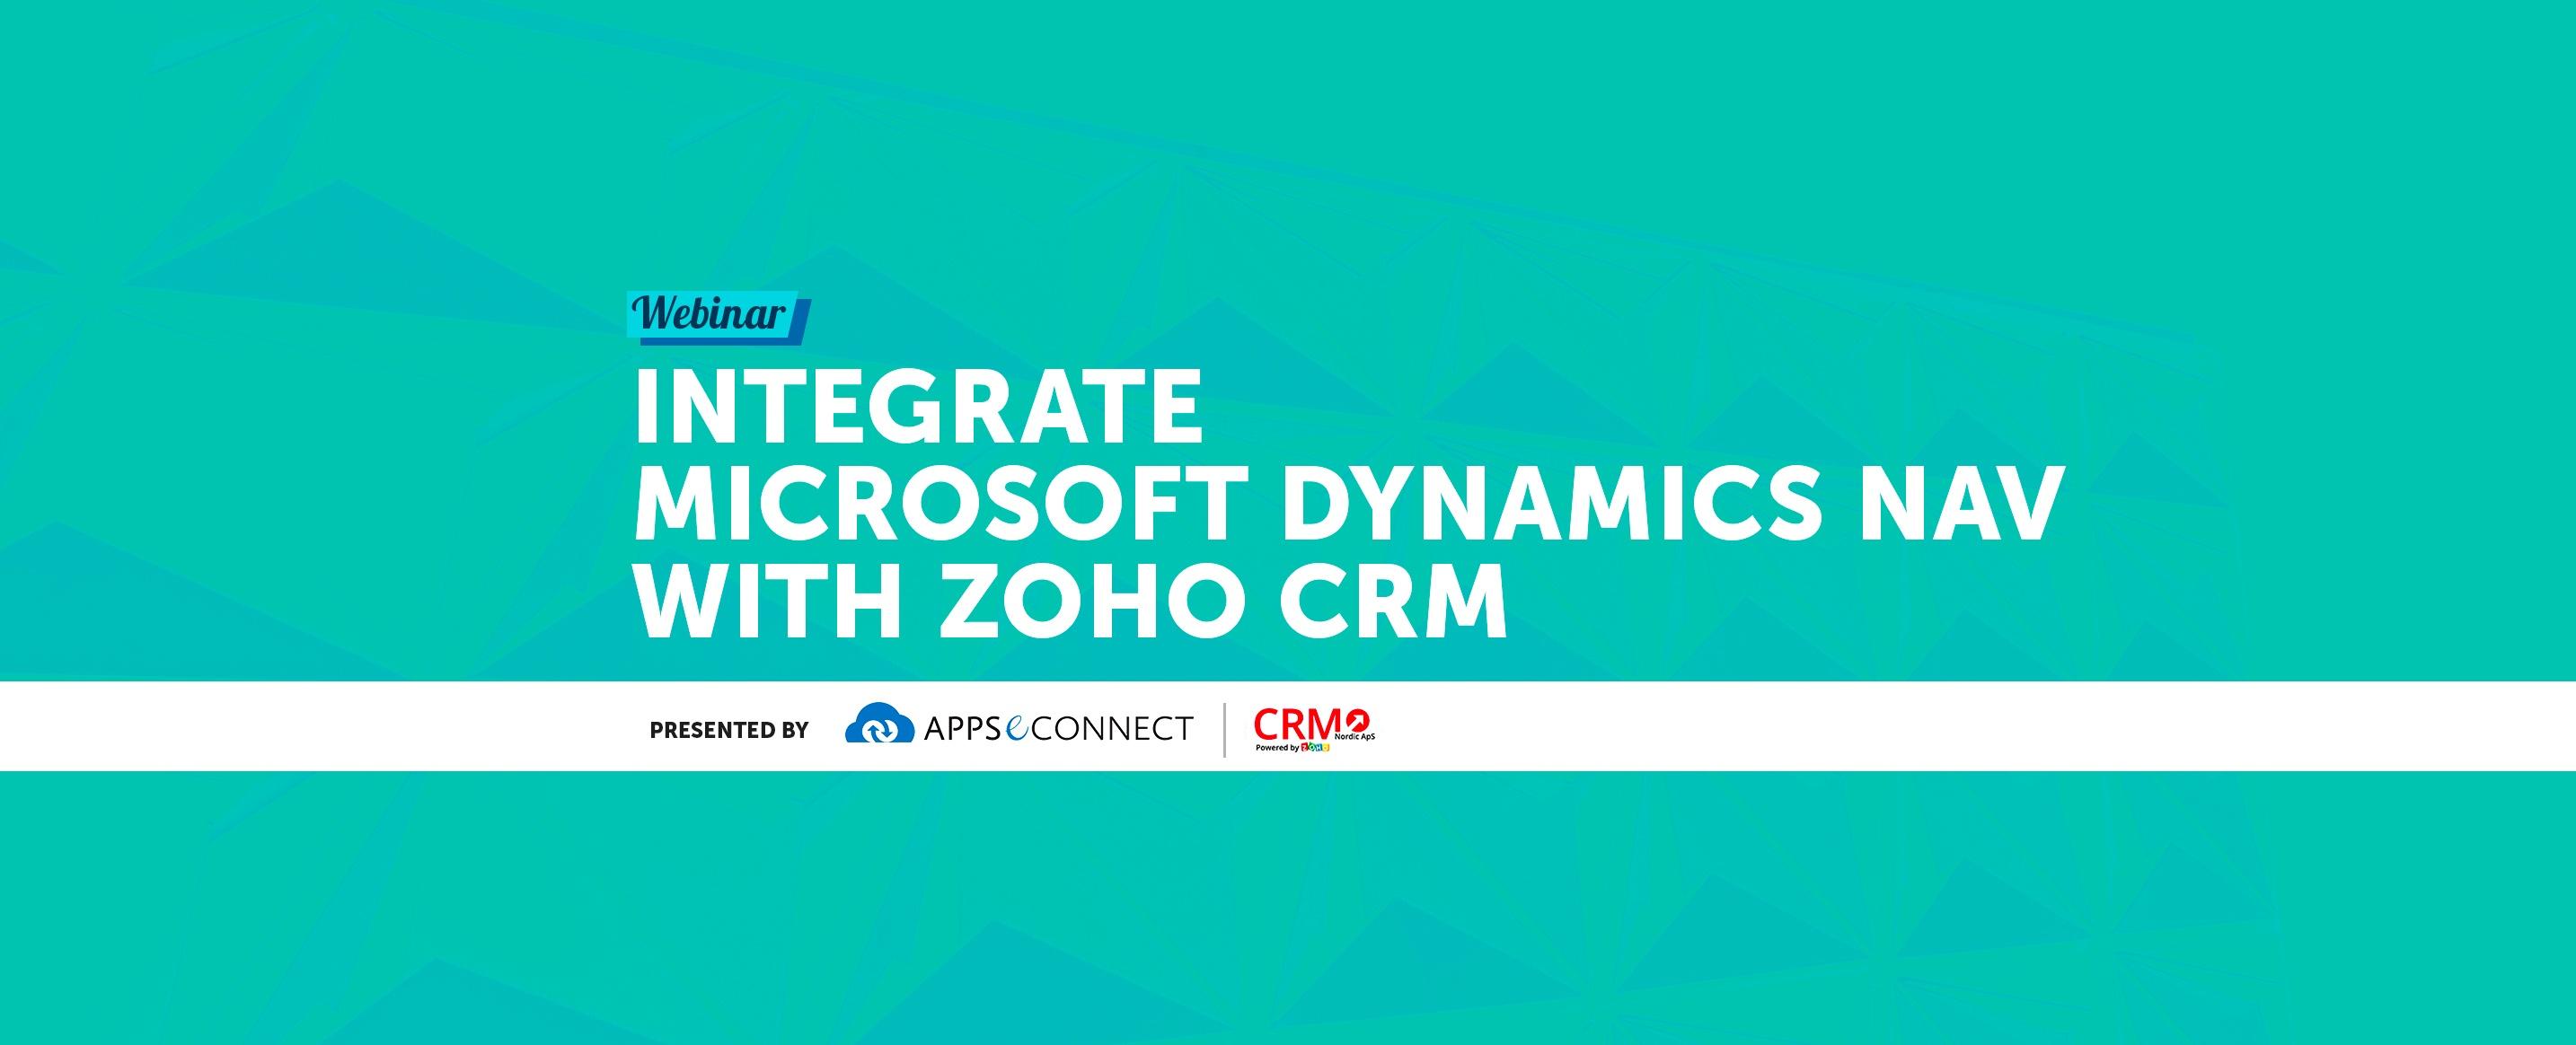 Webinar: Integrating Zoho CRM with Microsoft Dynamics NAV ERP – APPSeCONNECT